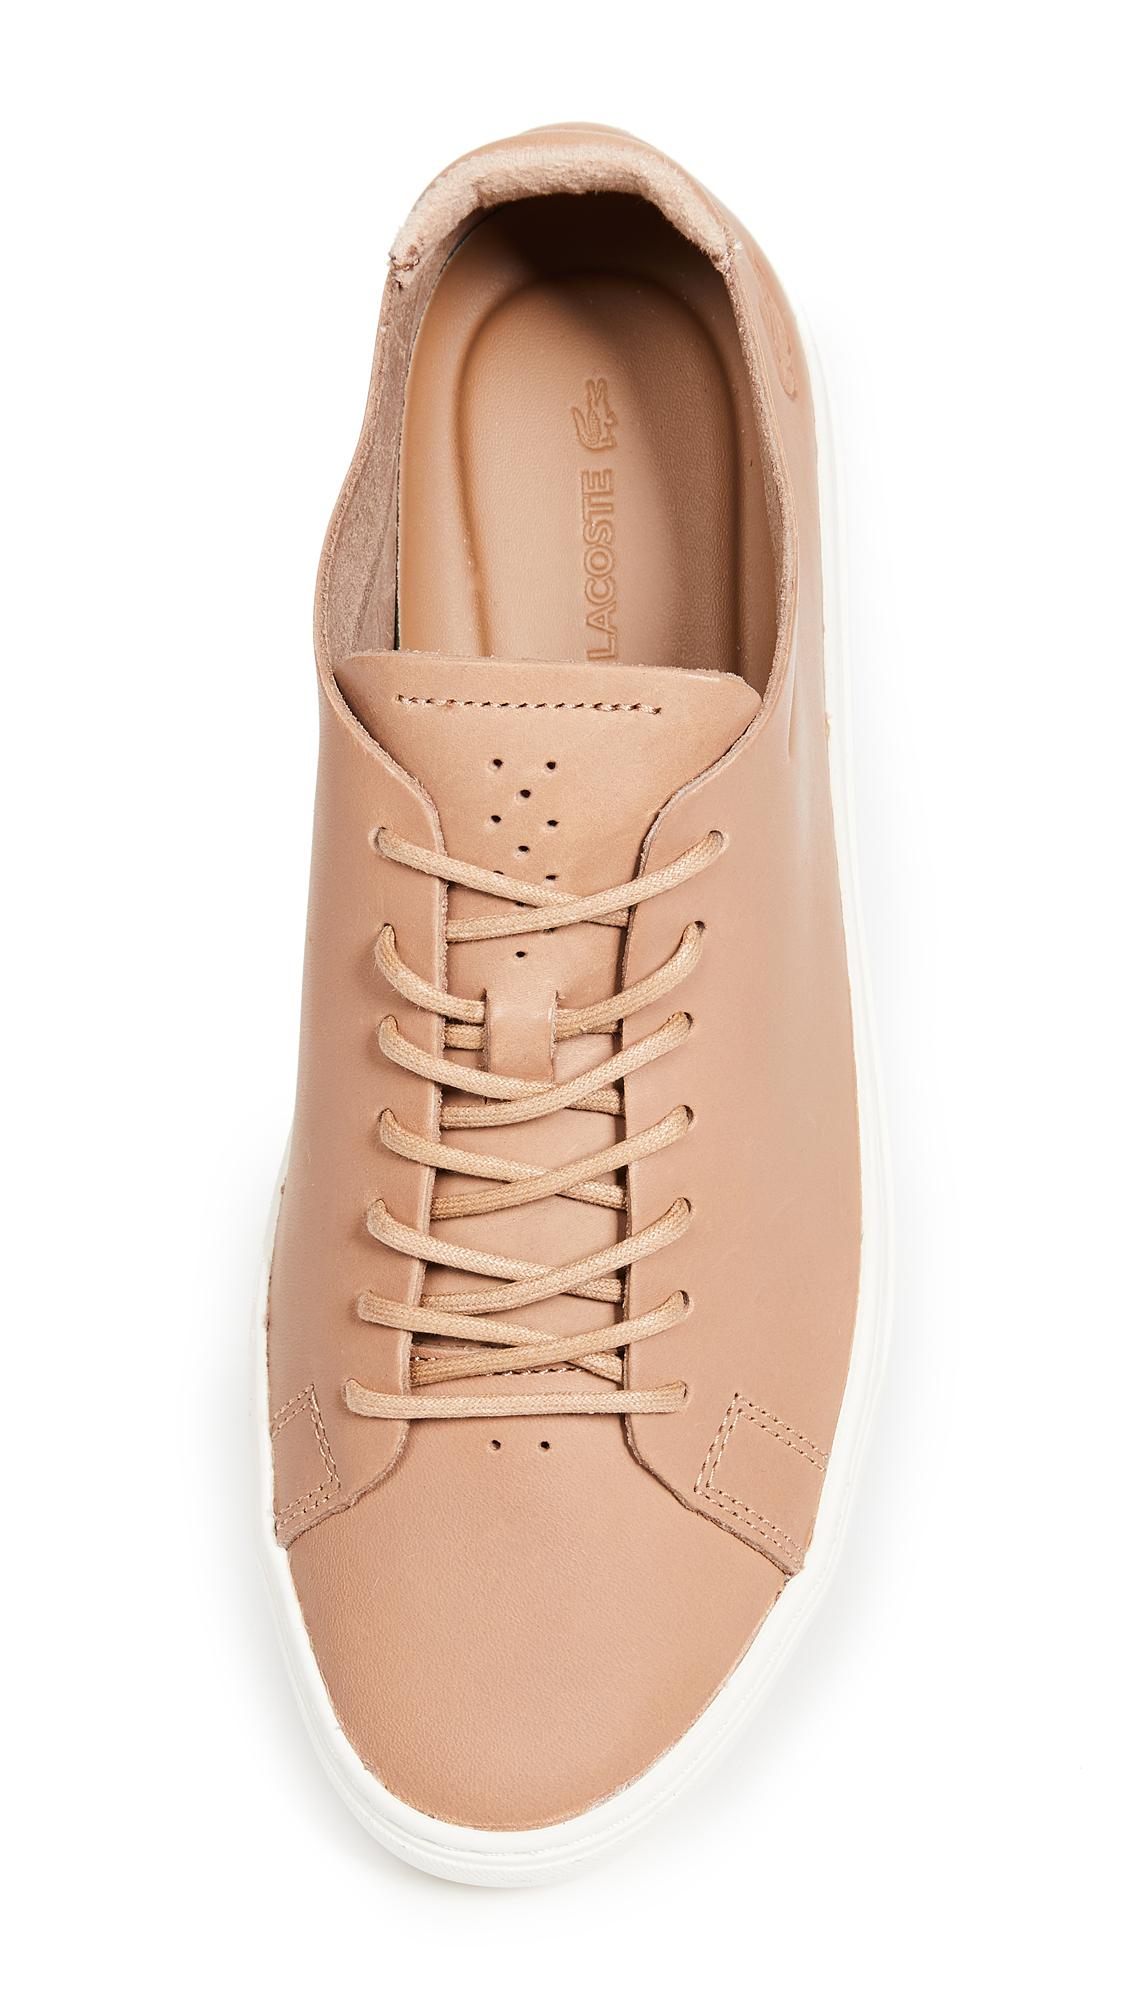 Lacoste L1212 Unlined Sneakers East Dane D Island Shoes Moccasine Slip On Suede Black